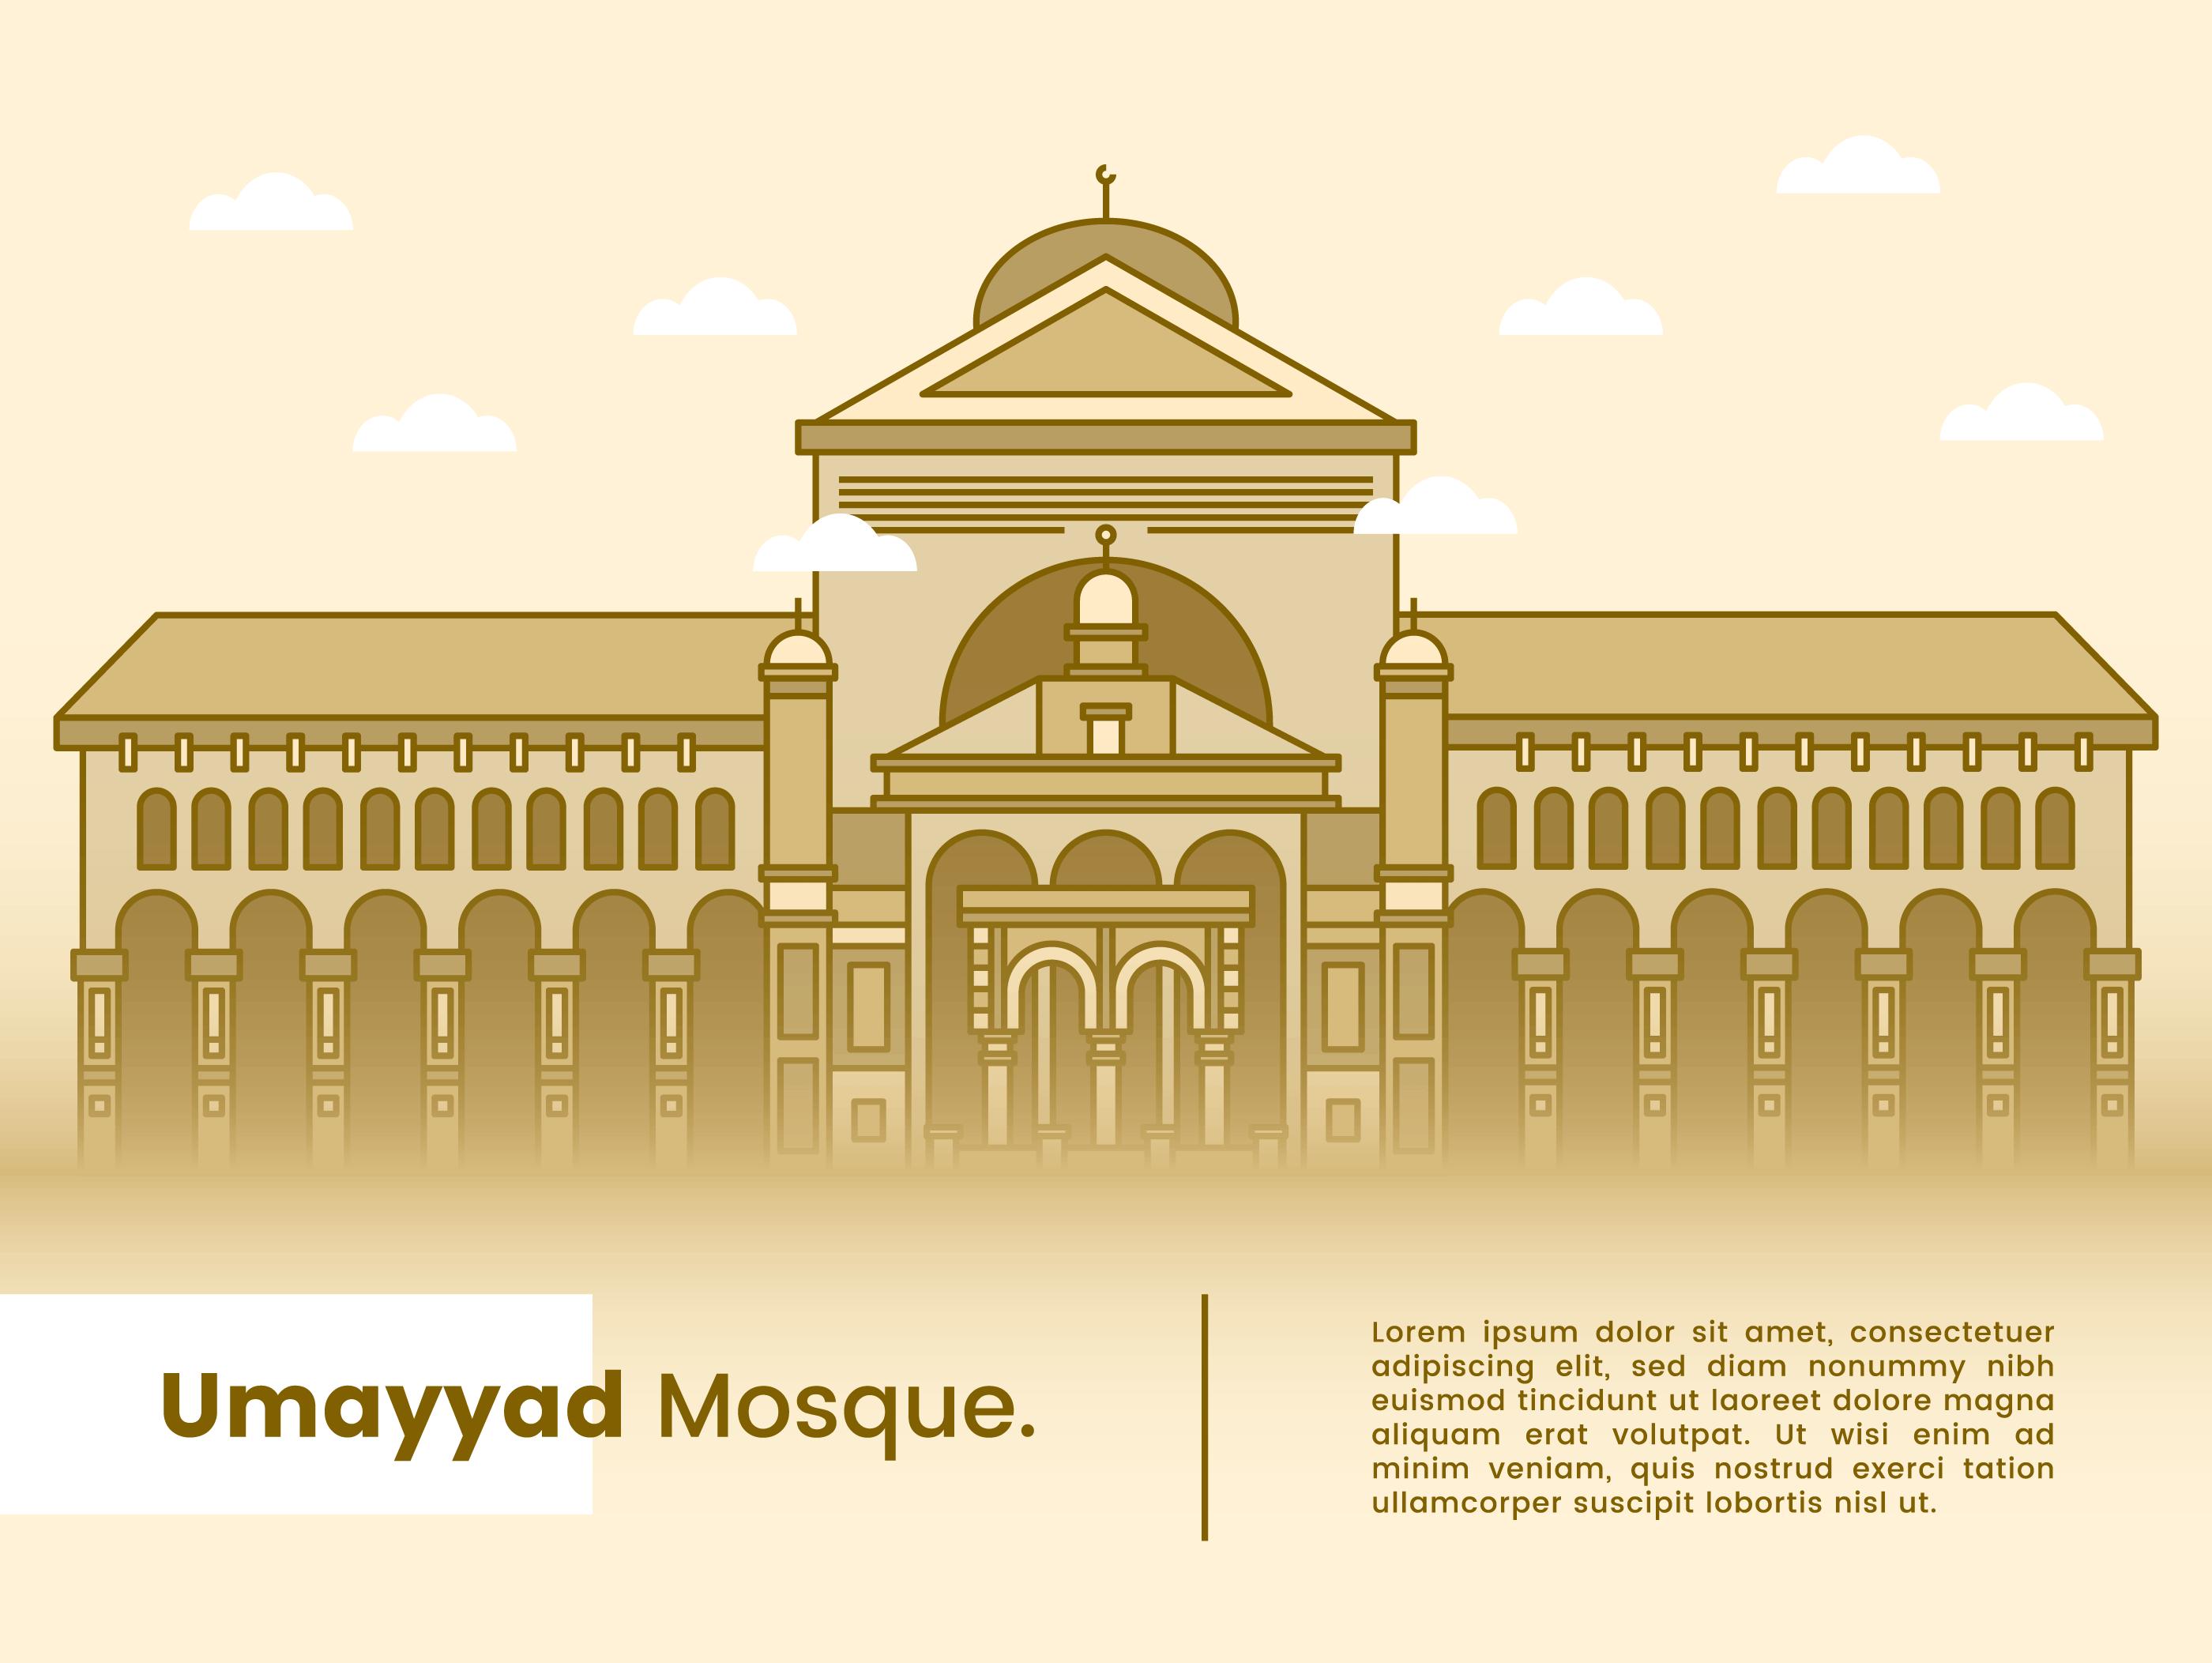 Umayyad Mosque Vector - Download Free Vectors, Clipart